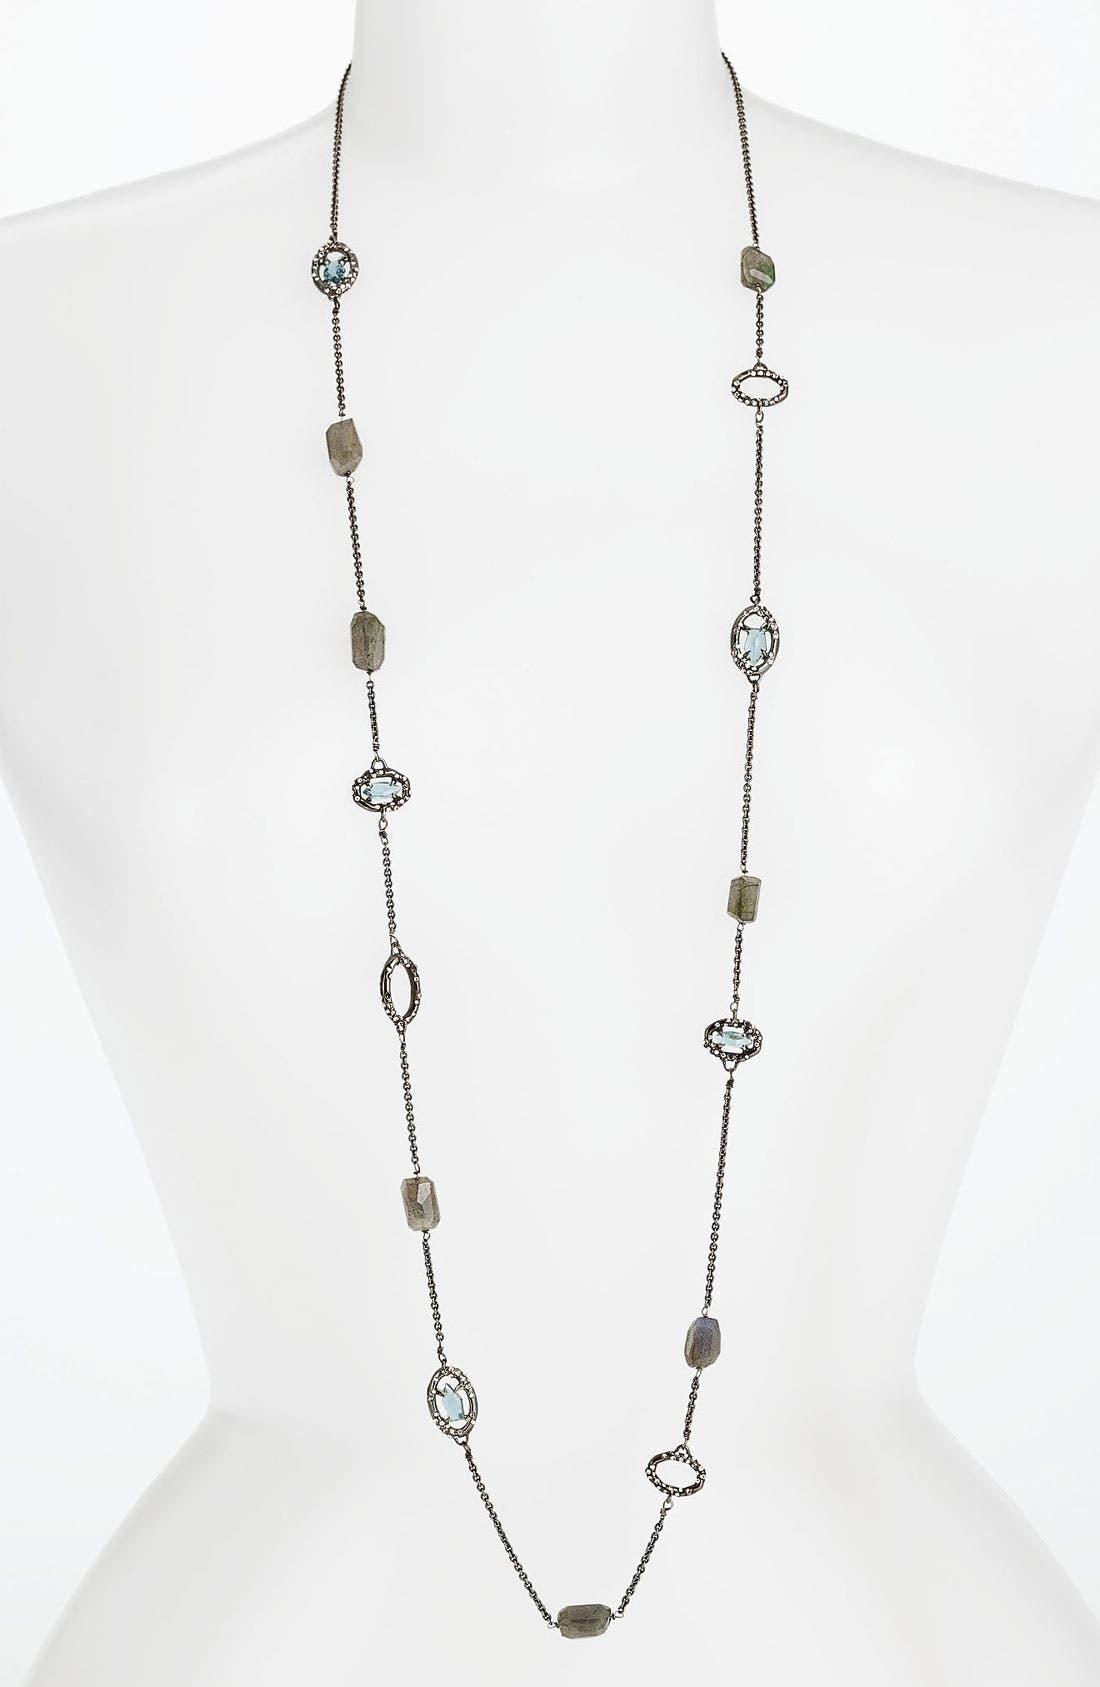 Alternate Image 1 Selected - Alexis Bittar 'Miss Havisham - Deco' Long Station Necklace (Nordstrom Exclusive)